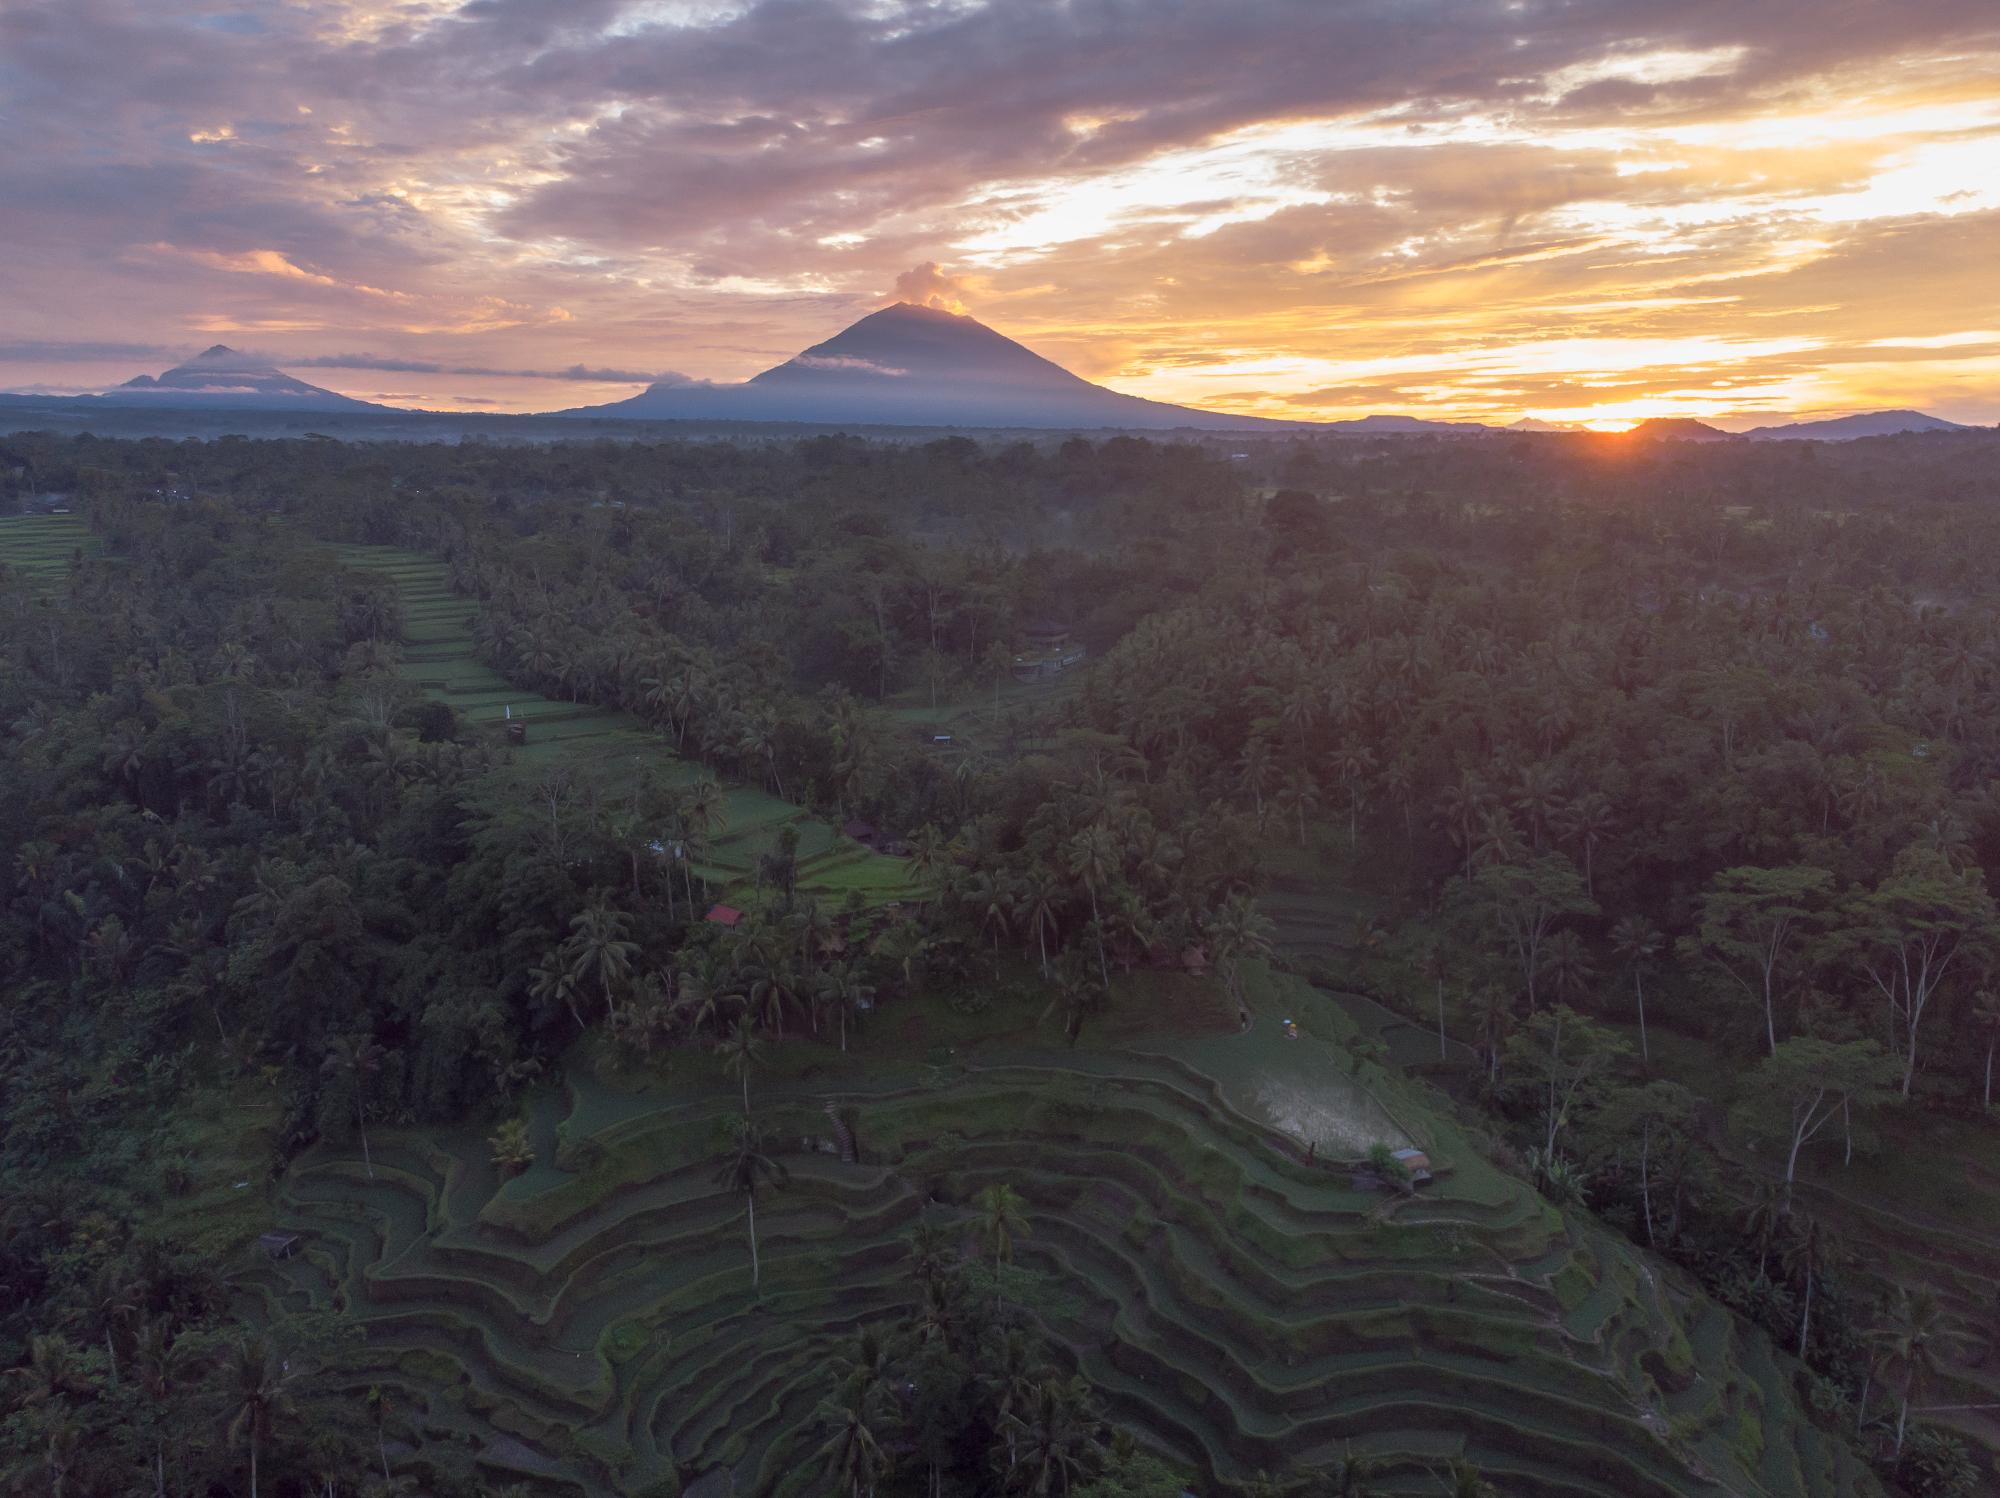 Bali Indonesia - Mavic Air